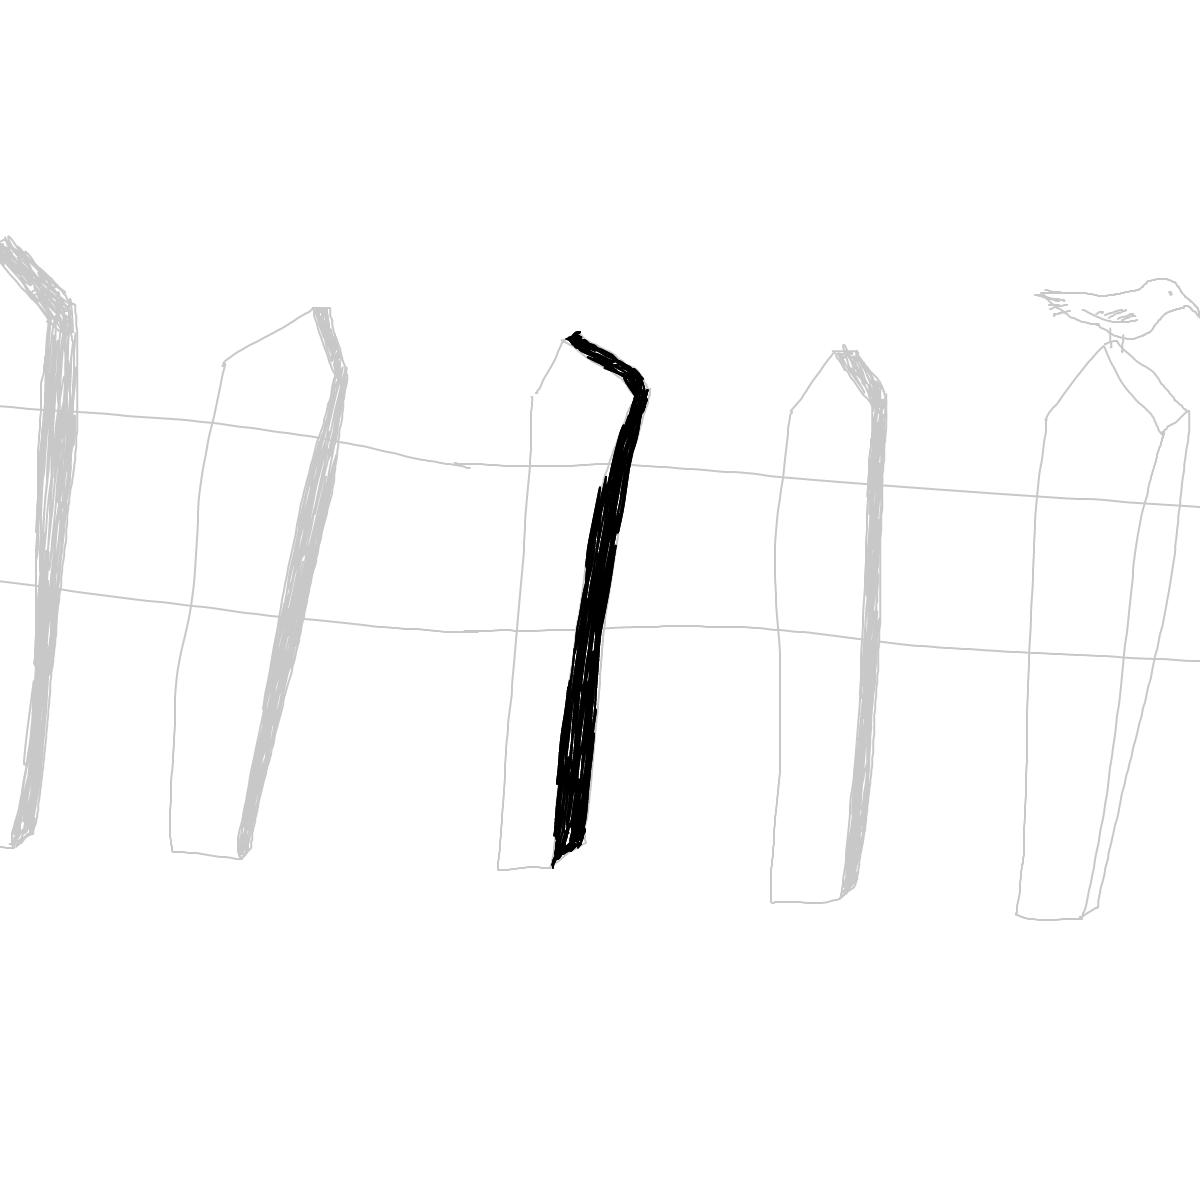 BAAAM drawing#9385 lat:52.4750442504882800lng: 13.4073257446289060